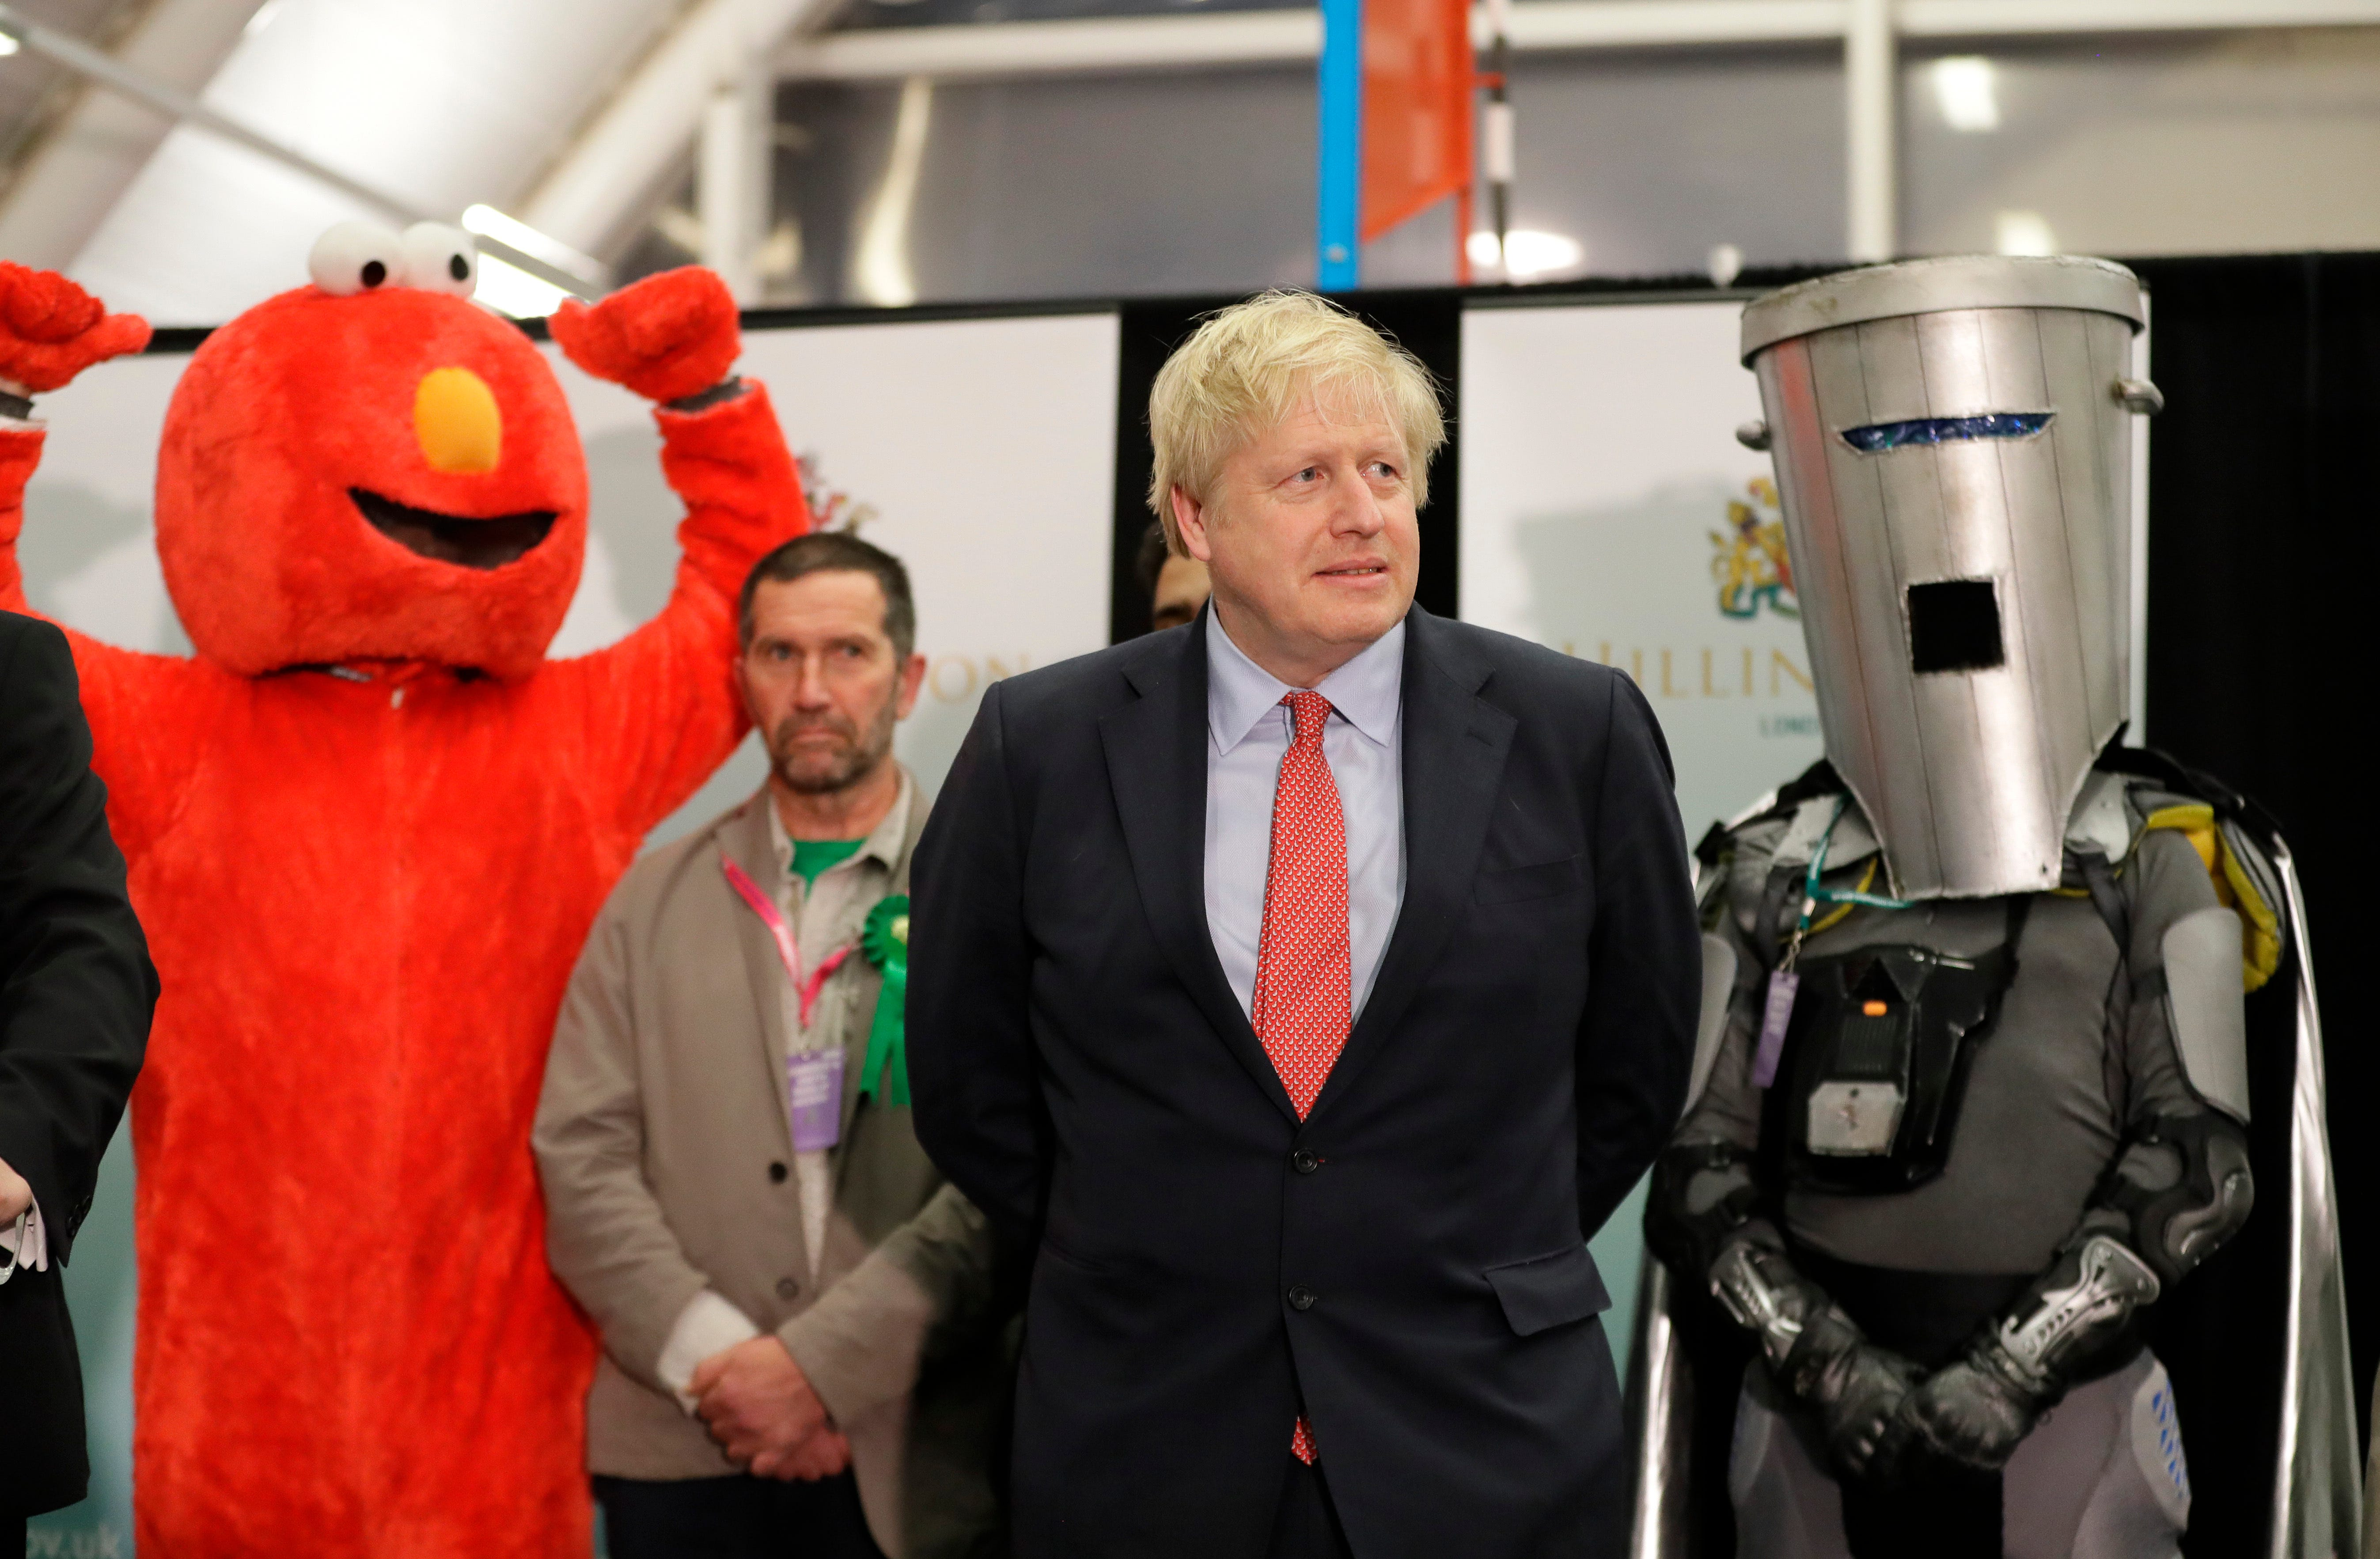 Analysis: Britain's 'strange' vote, won by Boris Johnson, heralds American-style 'shift'